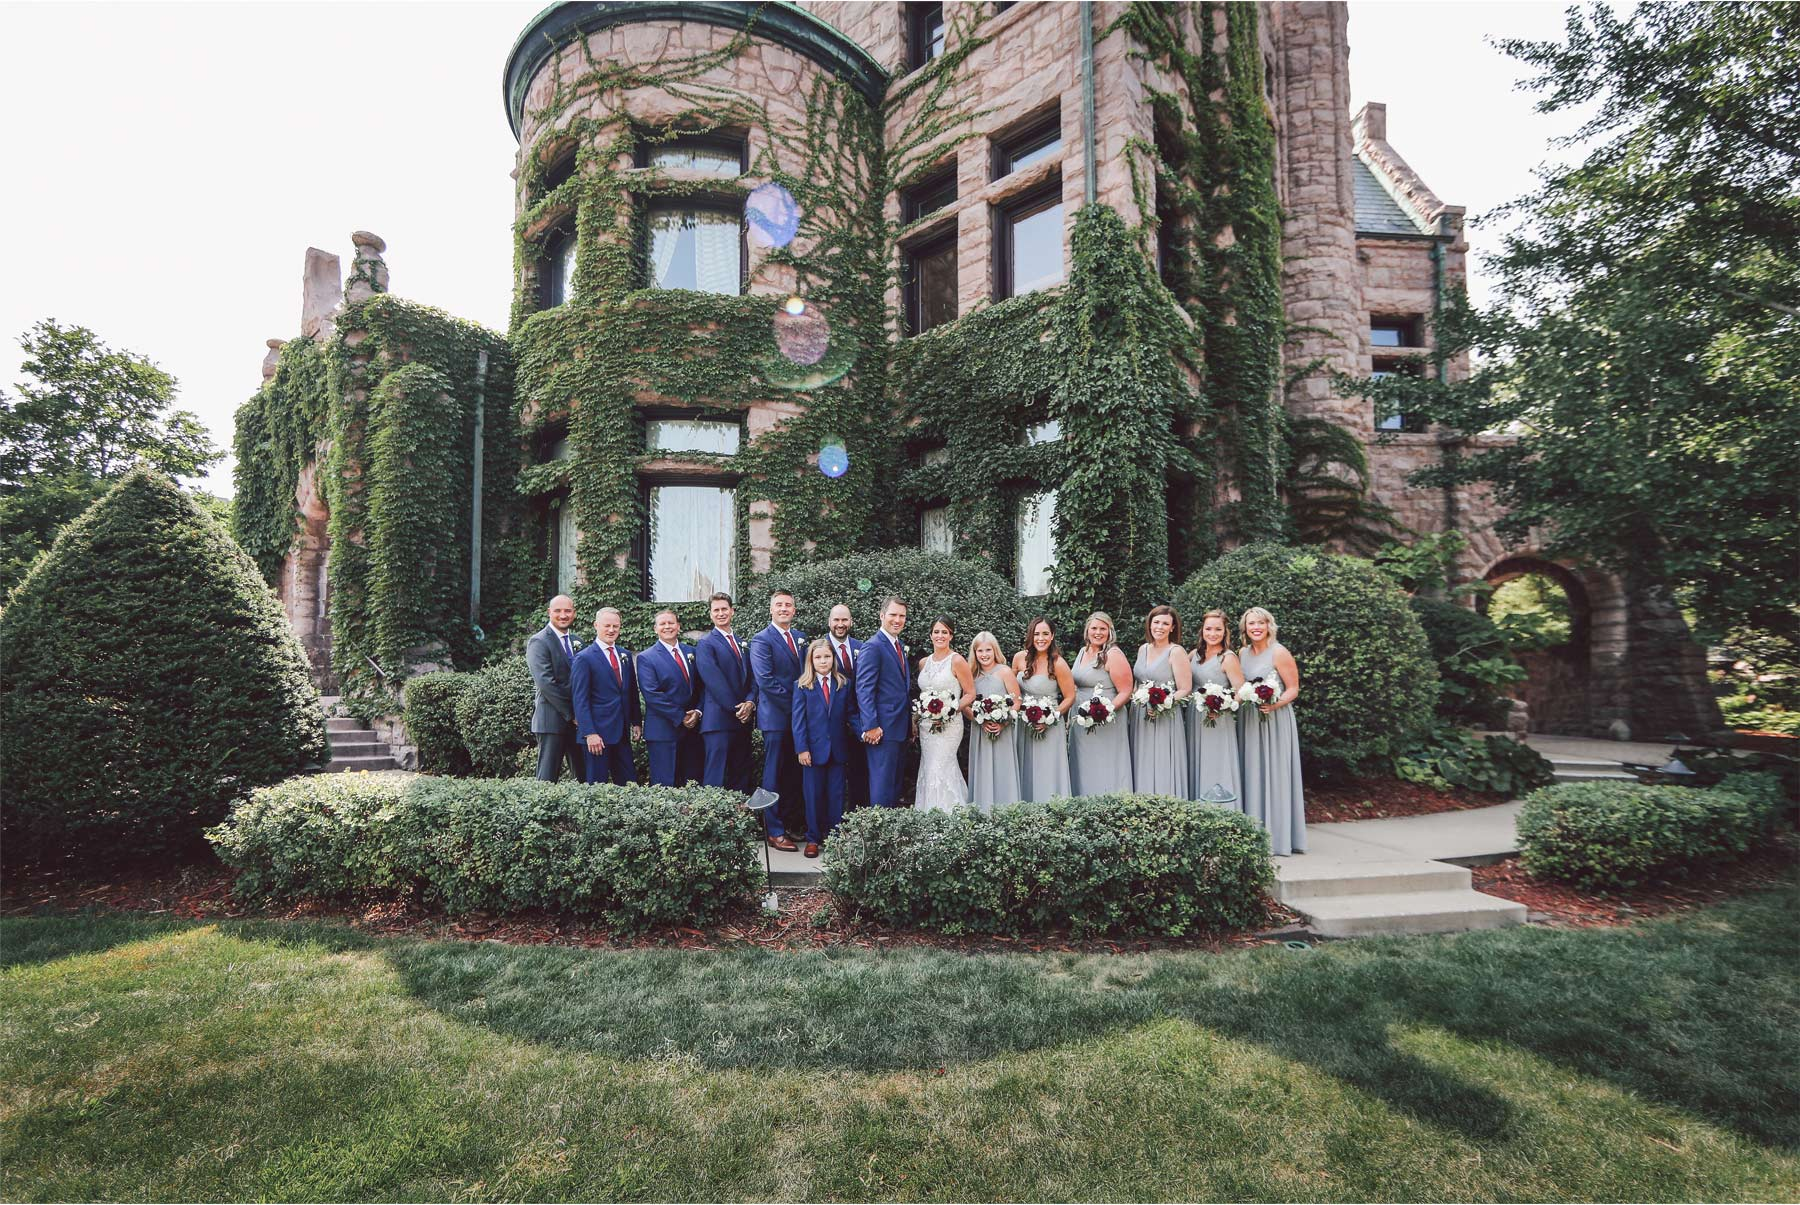 12-Minneapolis-Minnesota-Wedding-Photographer-by-Vick-Photography-Van-Dusen-Mansion-Wedding-Party-Group-Megan-and-Ned.jpg